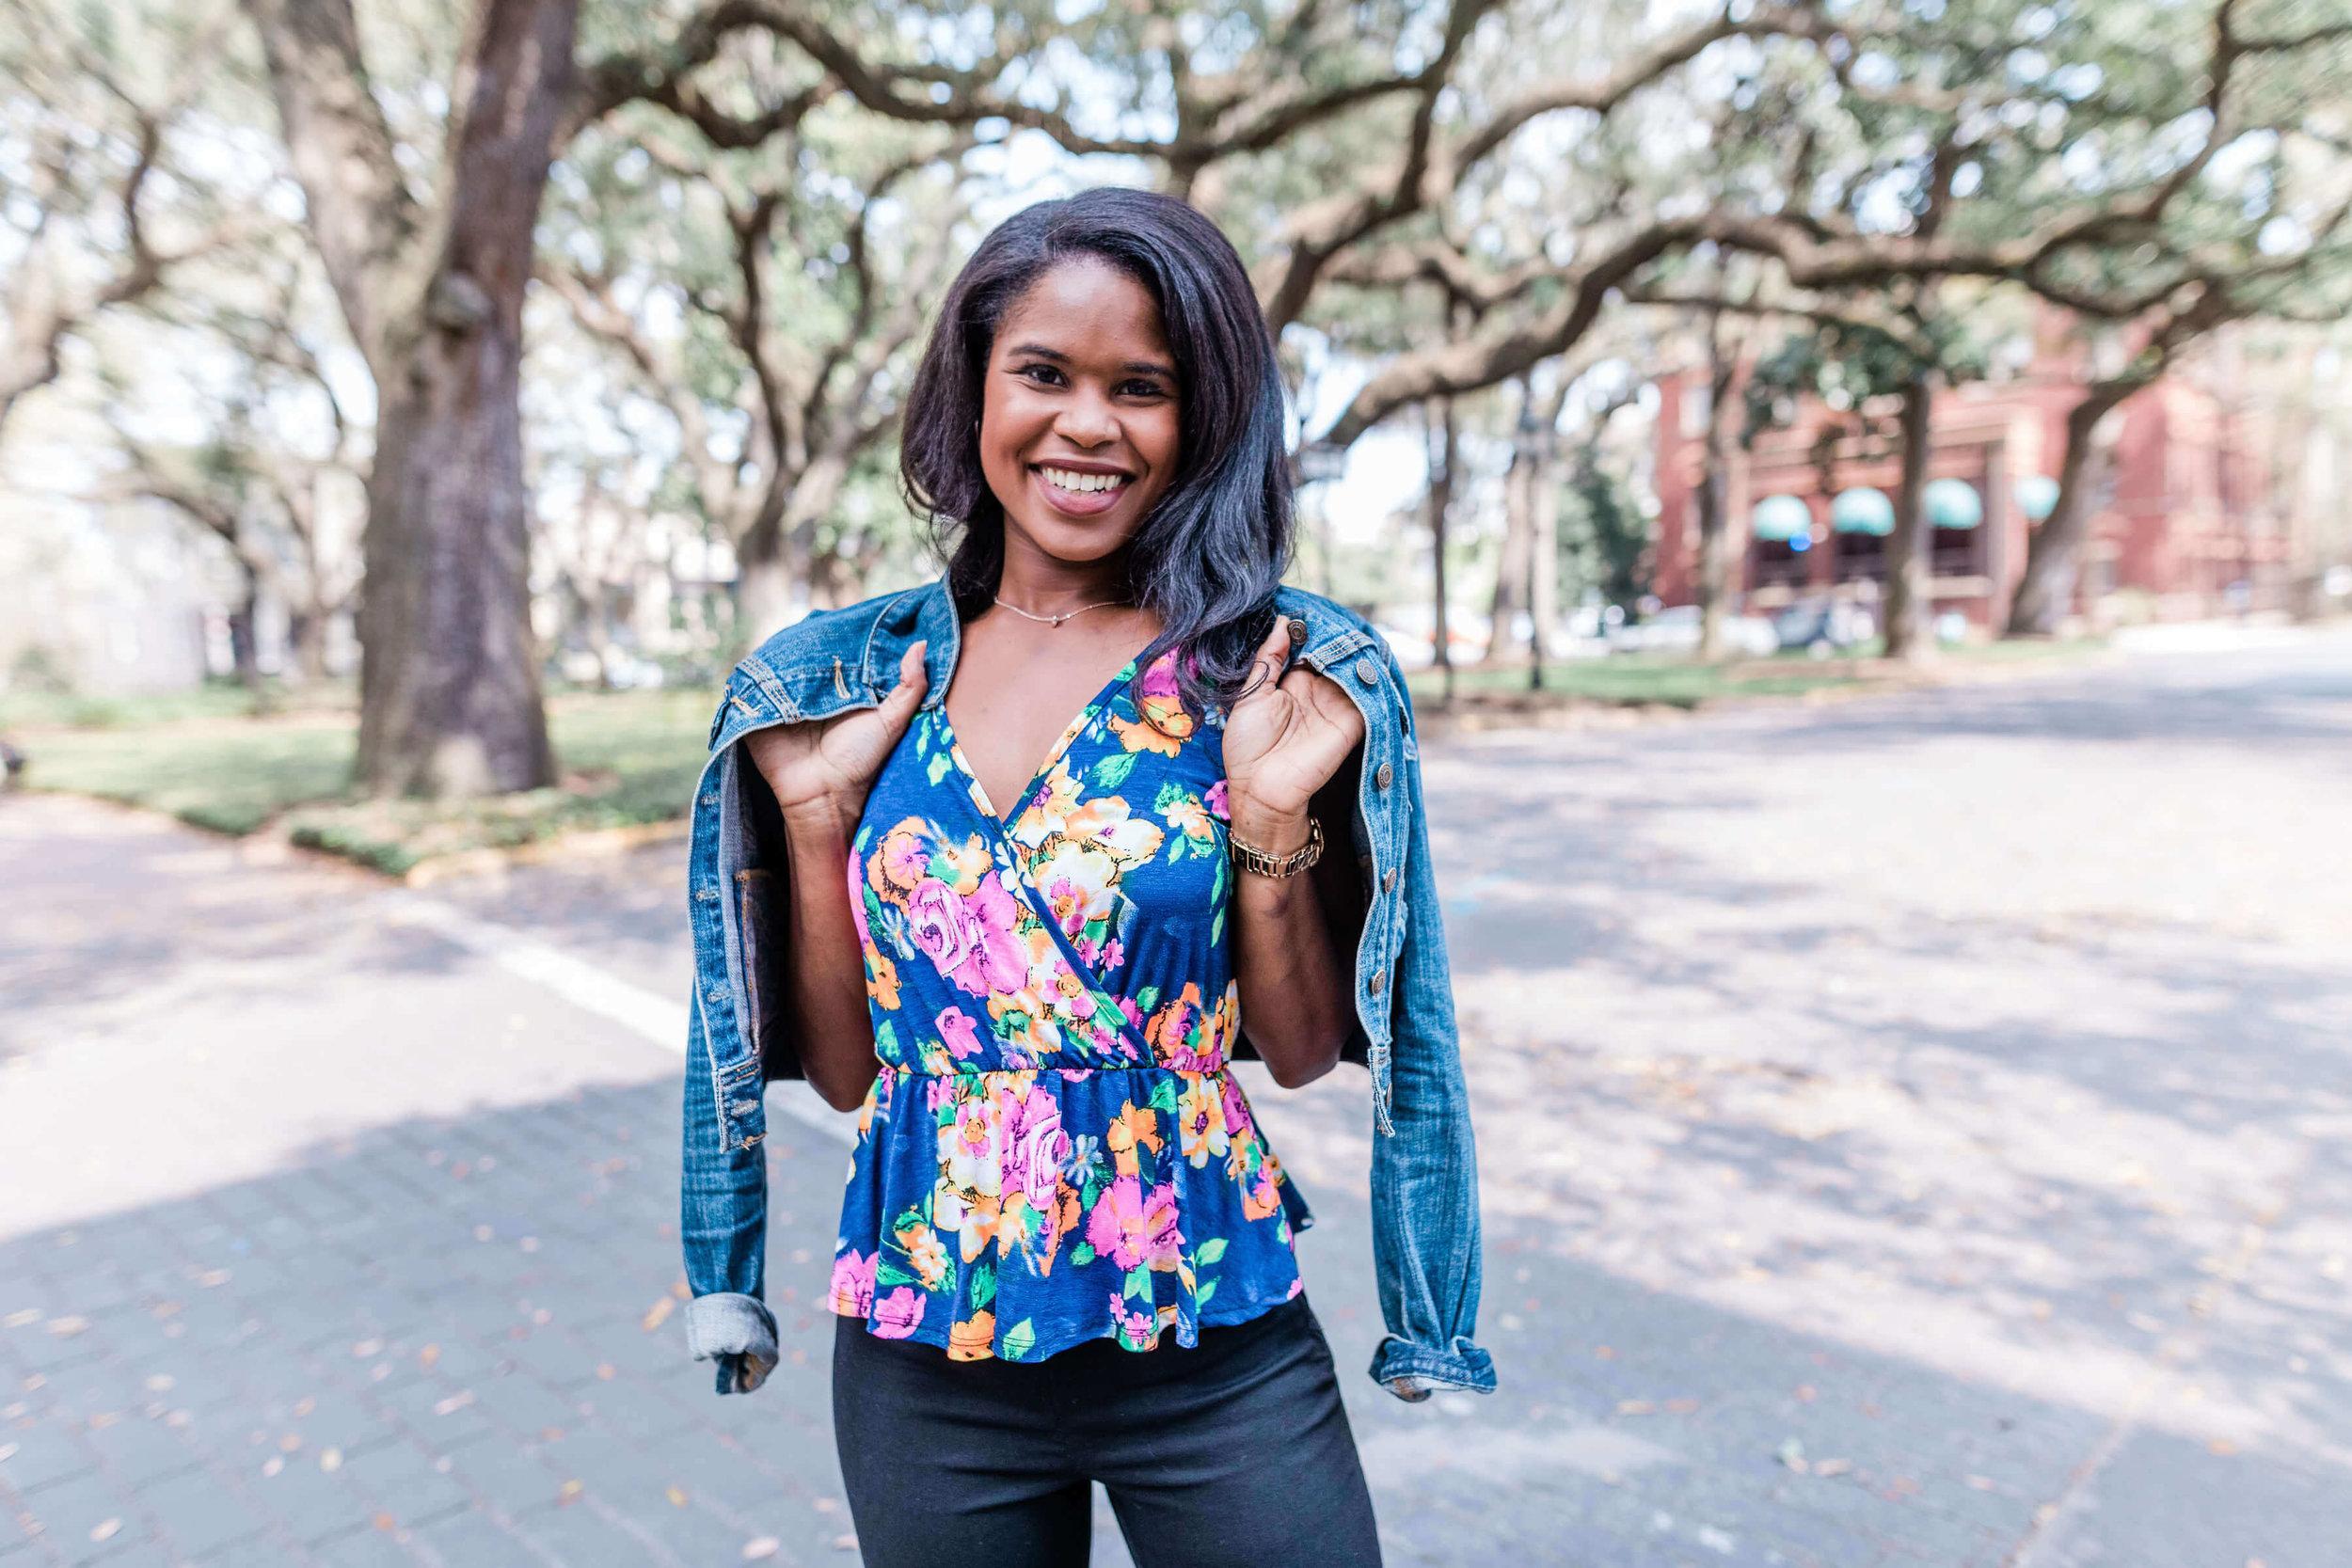 Apt B Photography - Savannah brand photographer, savannah headshot photographer, savannah portrait photographer